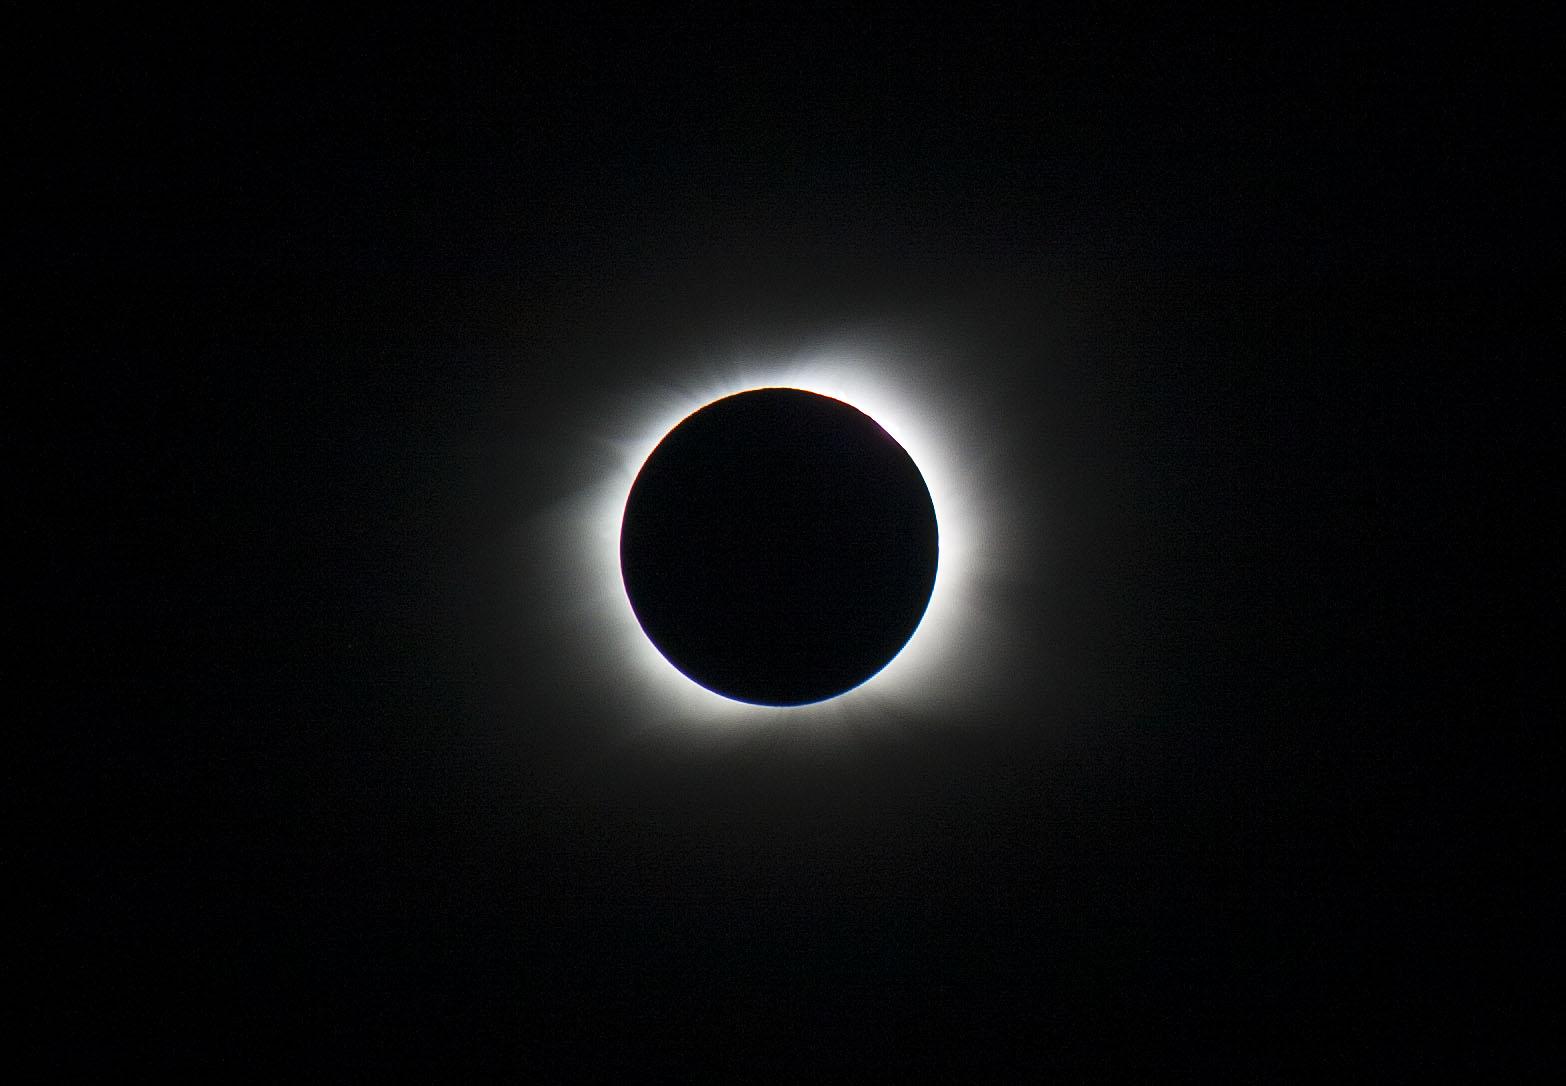 Ver el Eclipse total de Sol 2020